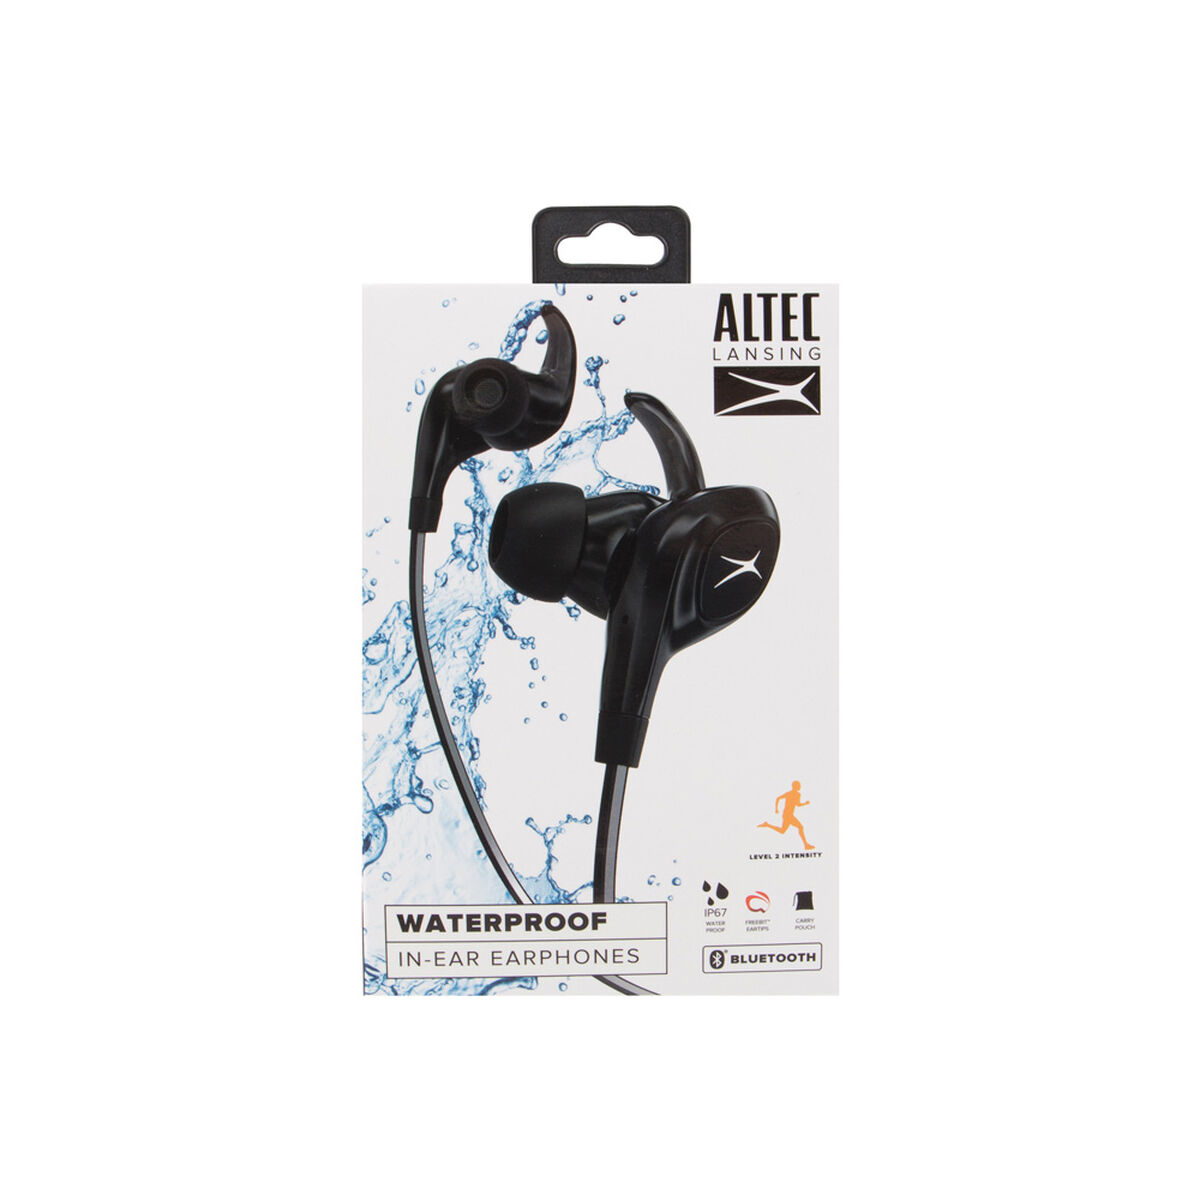 Audífonos Altec Lansing MZX399 BLK Negro